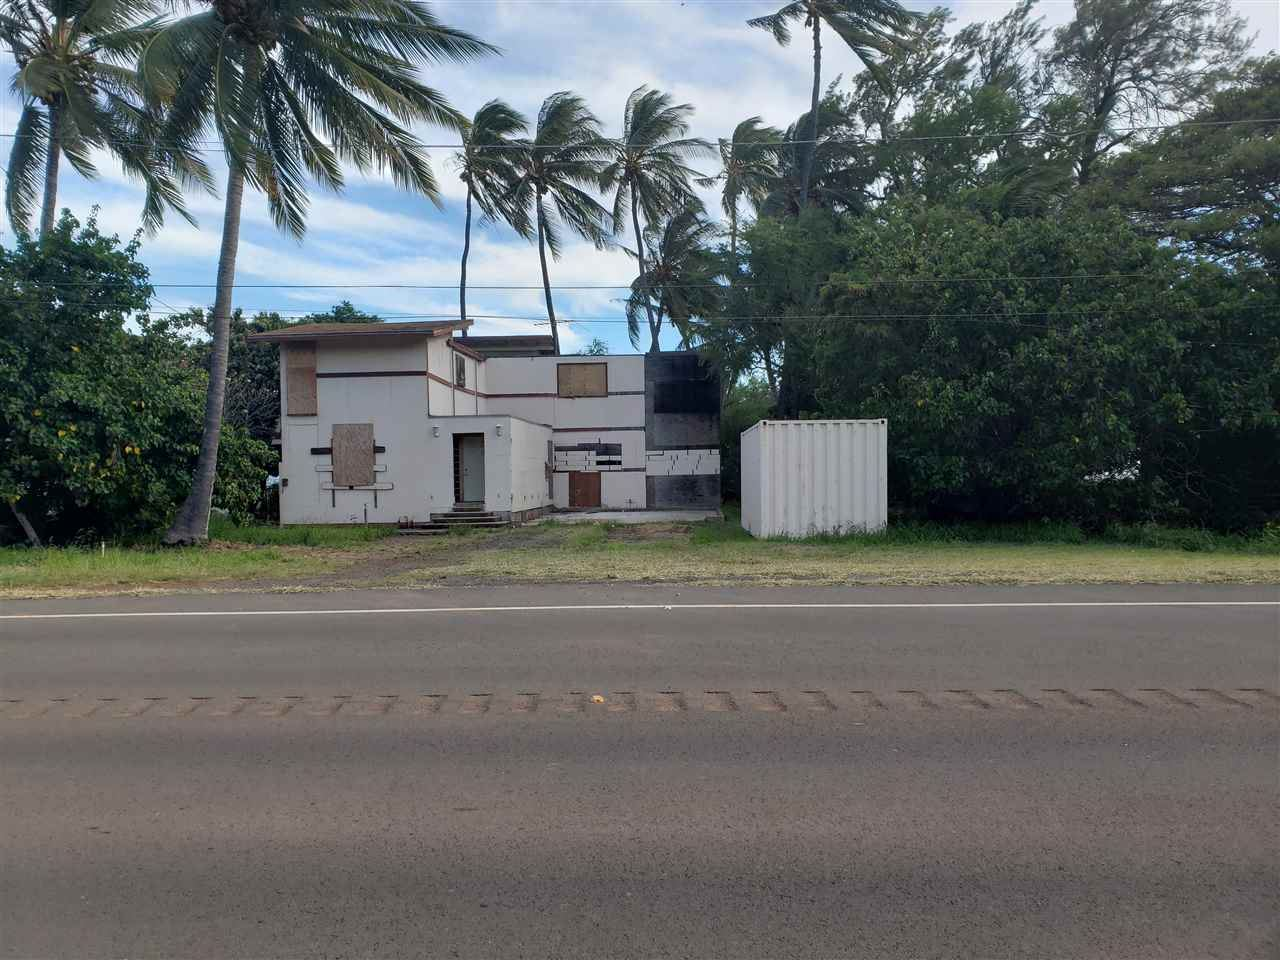 Photo of 2724 Kamehameha V Hwy, Kaunakakai, HI 96748 (MLS # 386558)